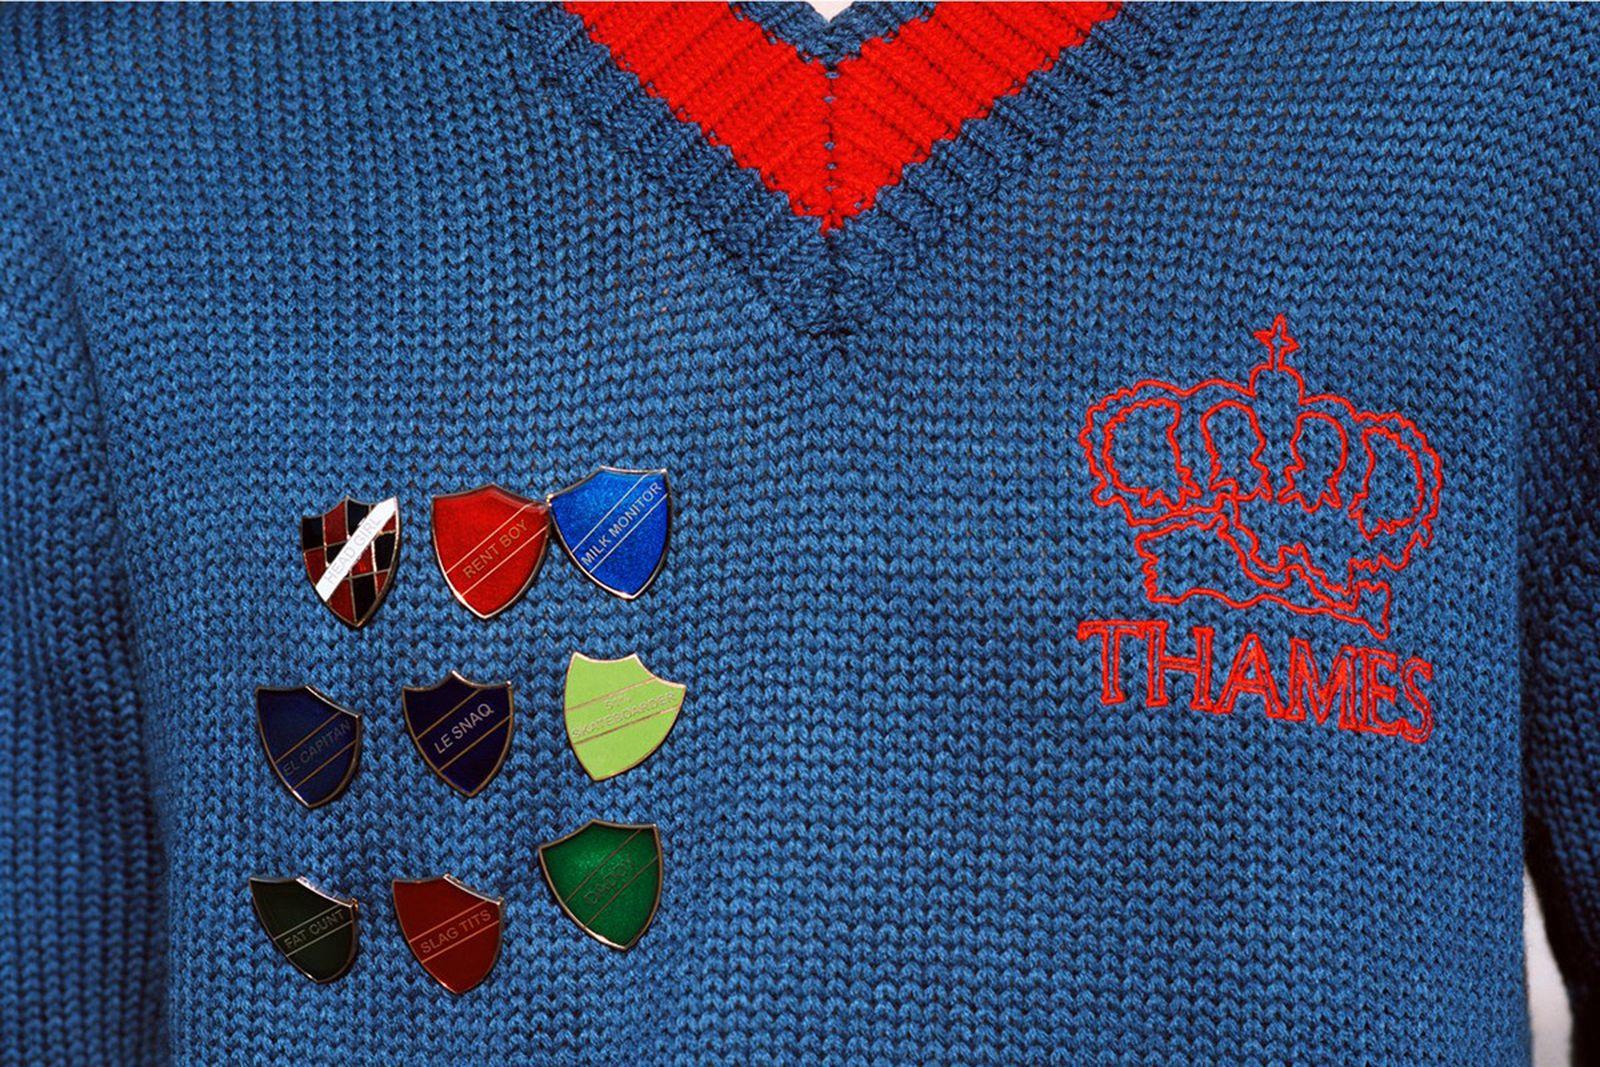 THAMES MMXX knit sweater